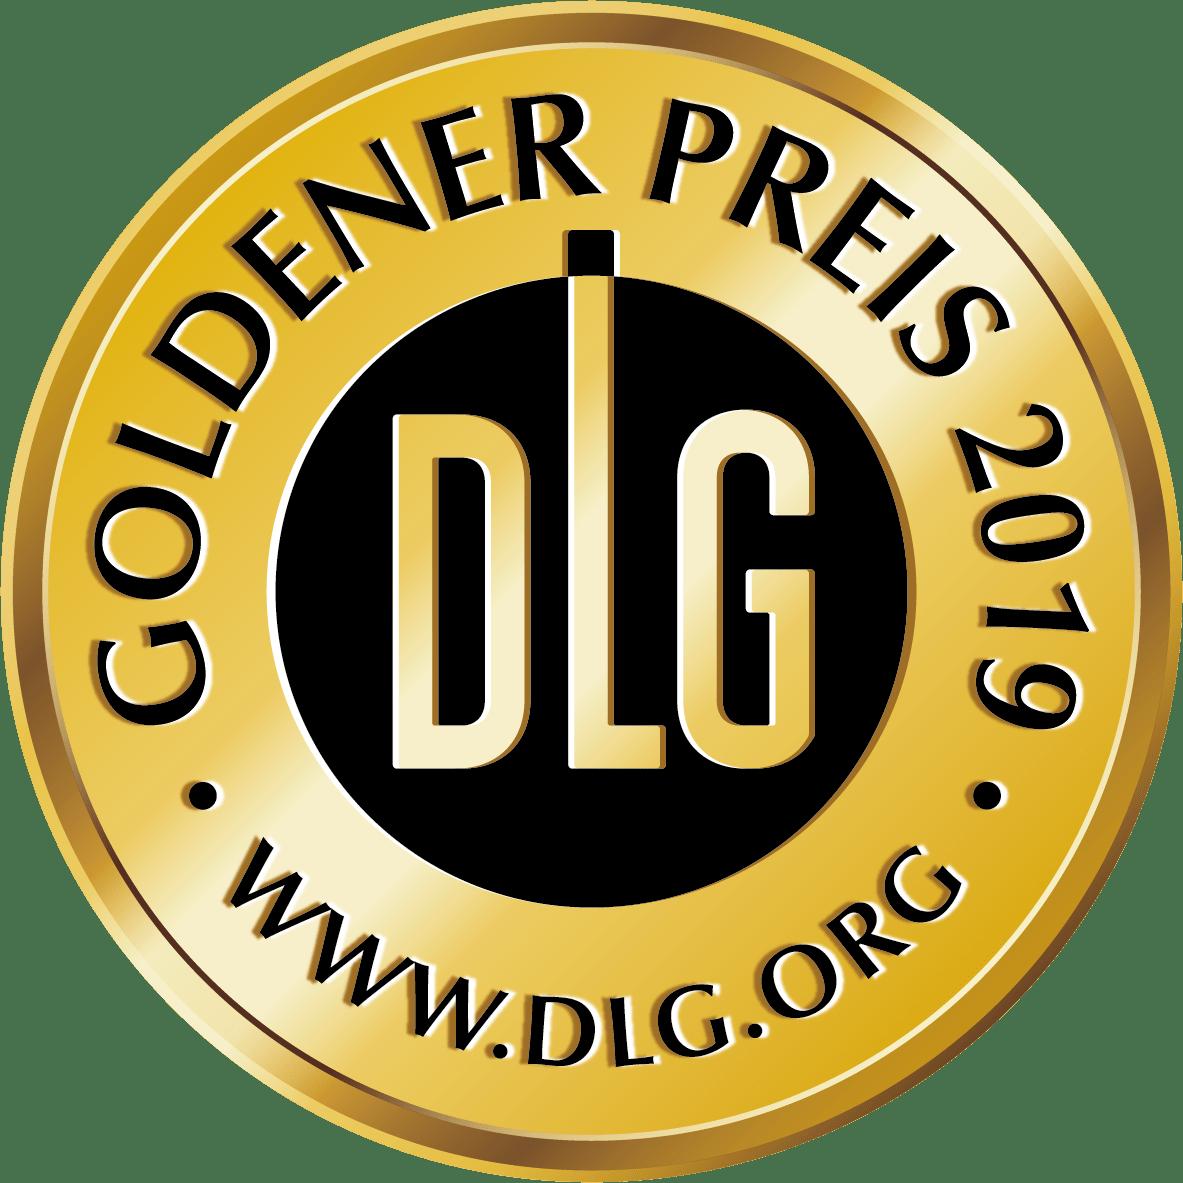 https://hofmark.com/wp-content/uploads/Gold_RGB_2019.png